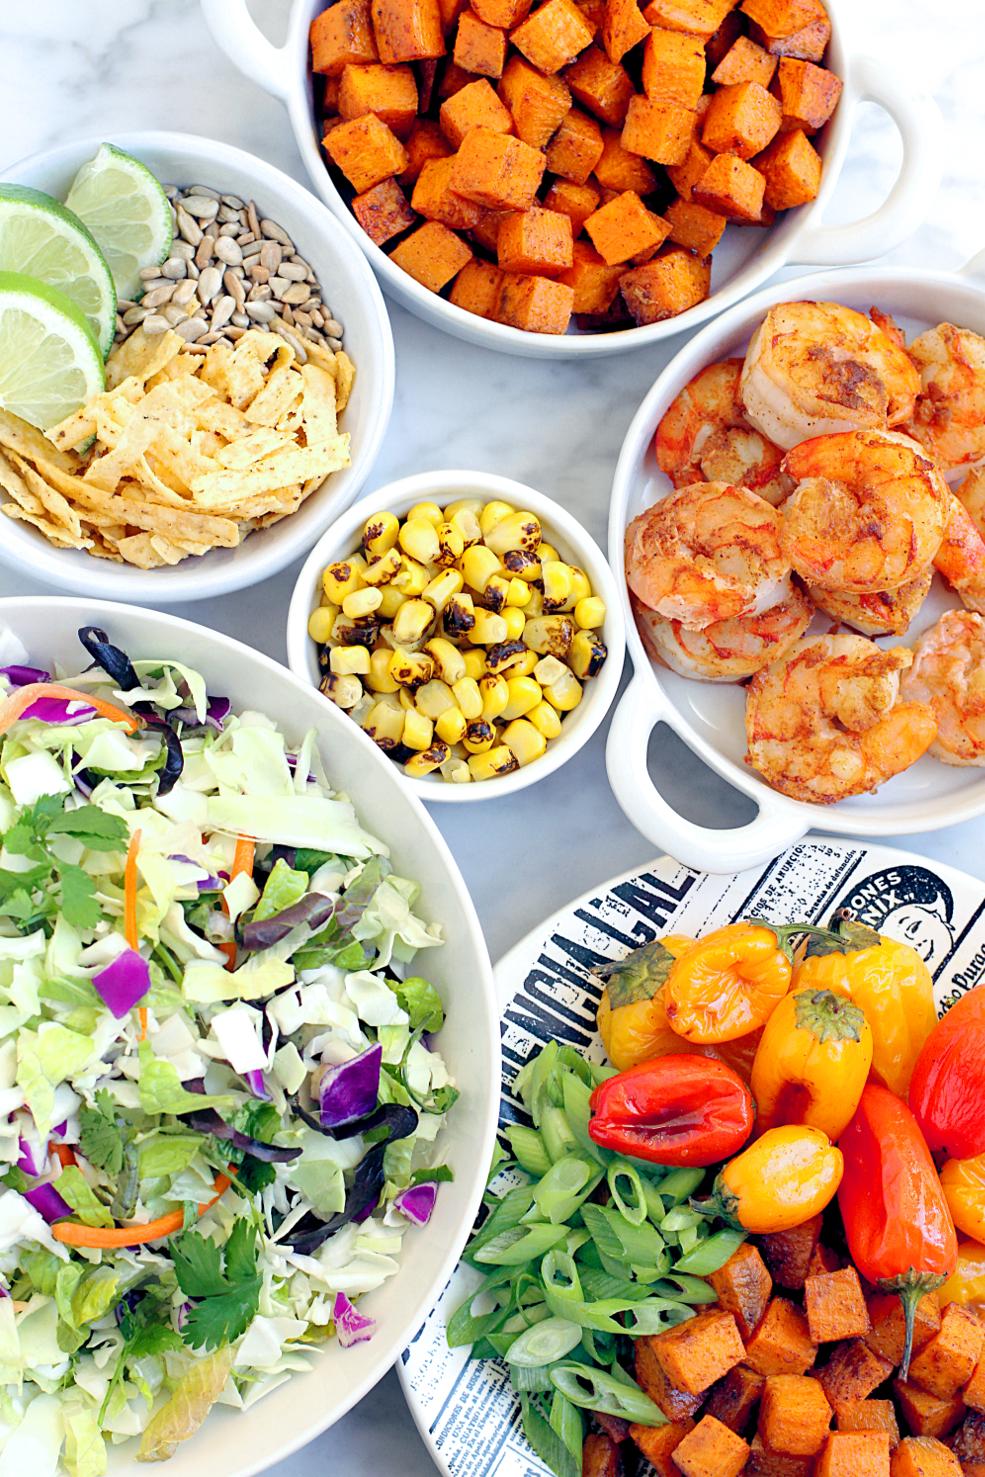 Image of Southwestern shrimp salad ingredients.